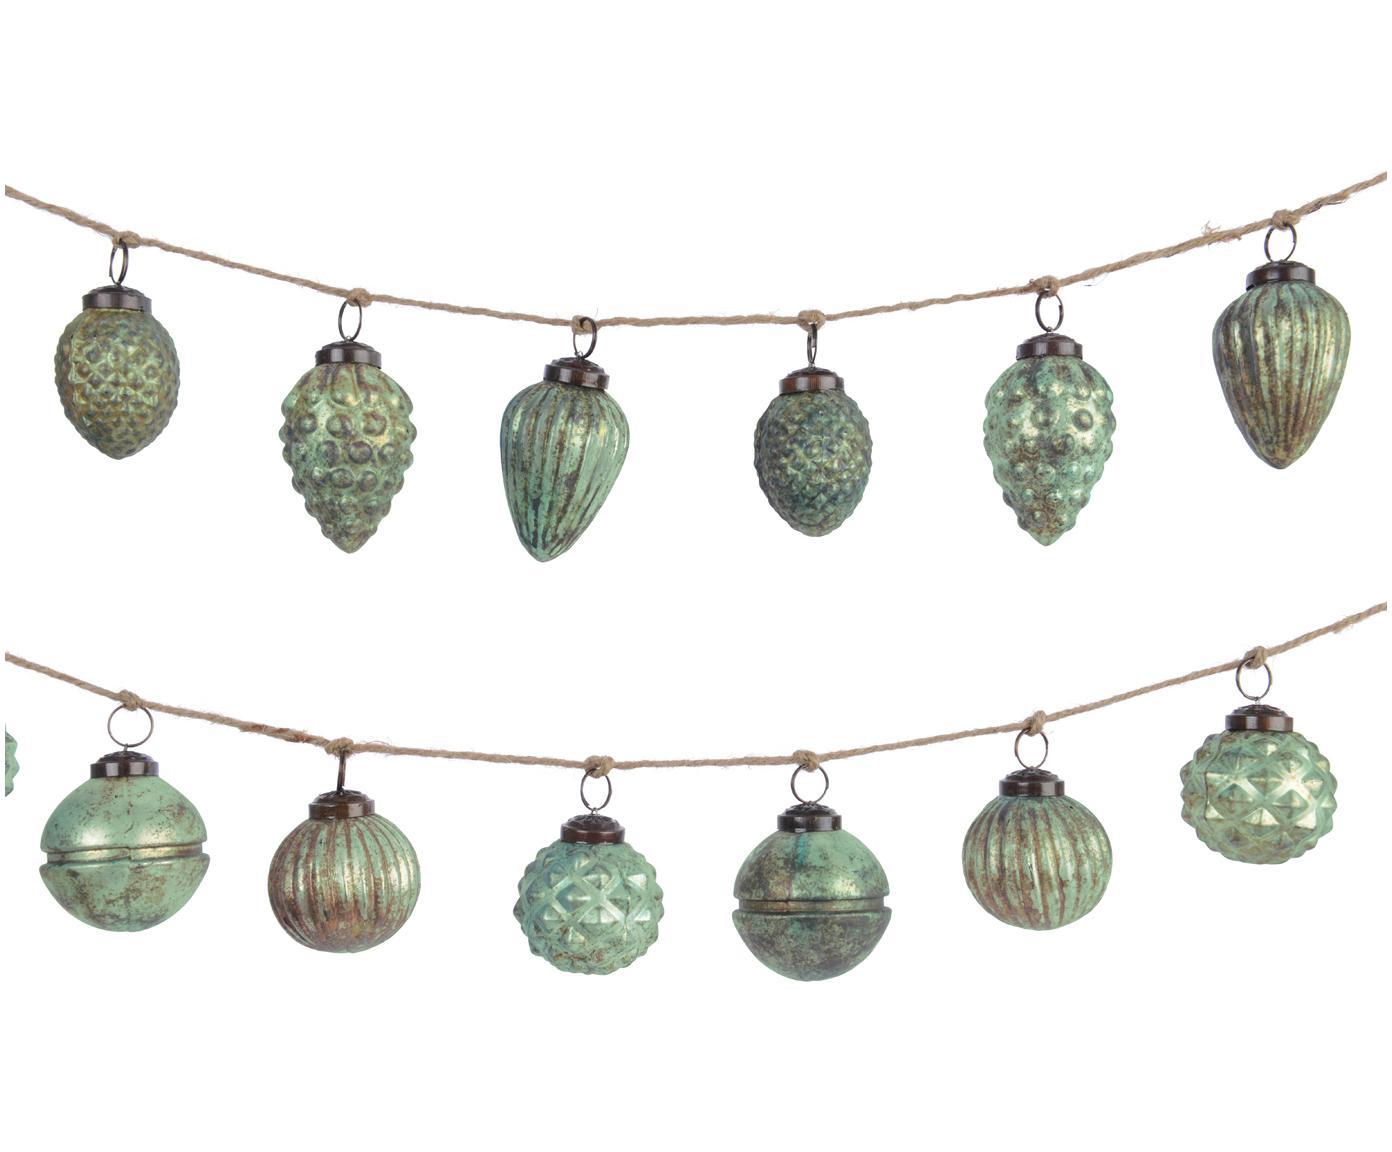 Set de guirnaldas navideñas Dil, 2pzas., Vaso, Verde, L 120 cm